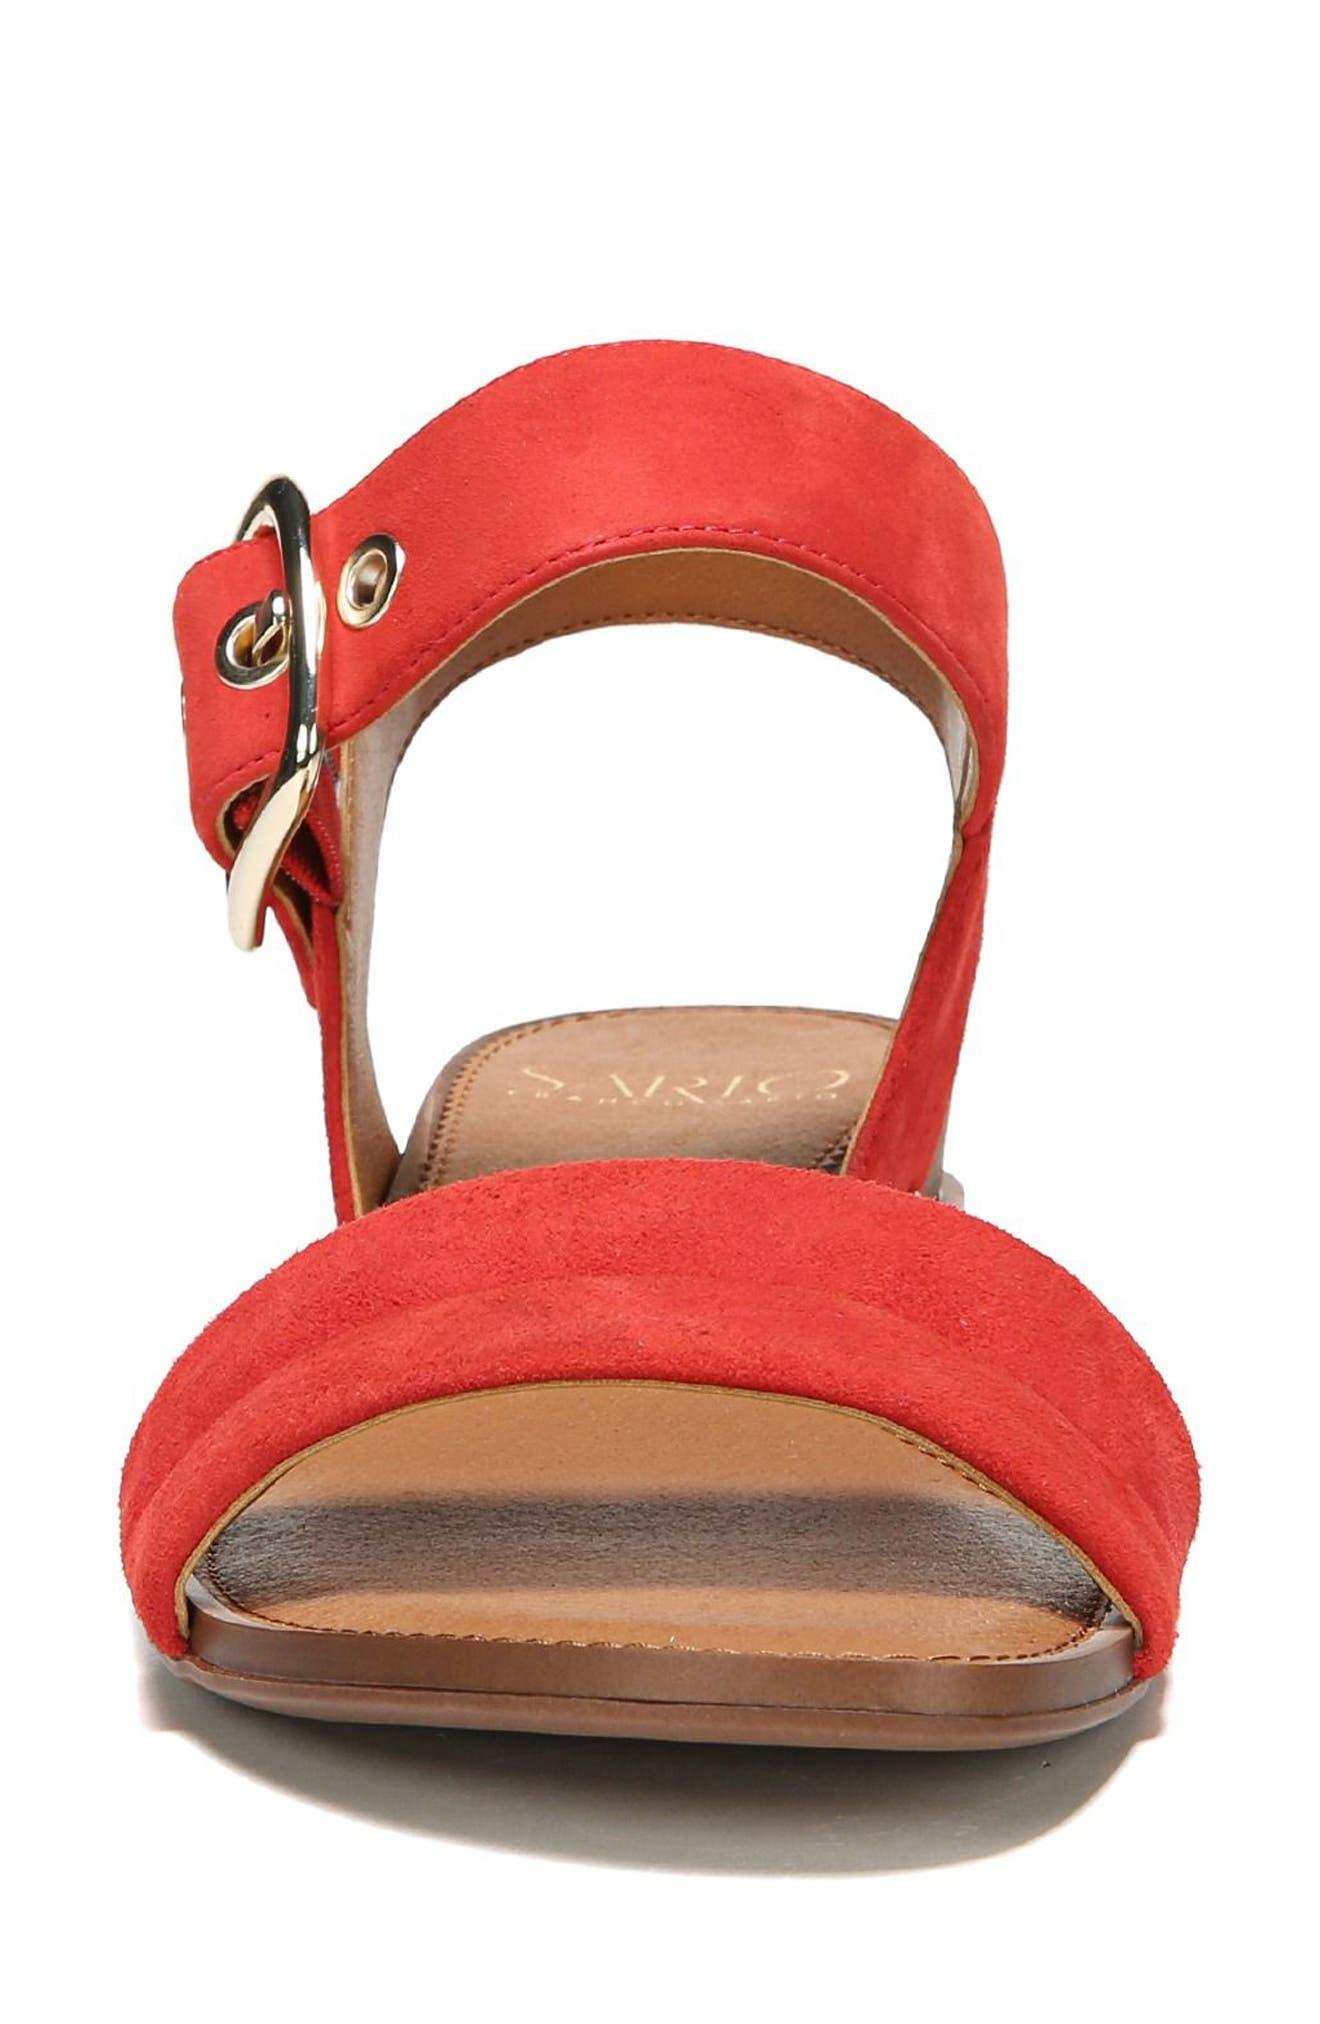 Patterson Low Wedge Sandal,                             Alternate thumbnail 25, color,